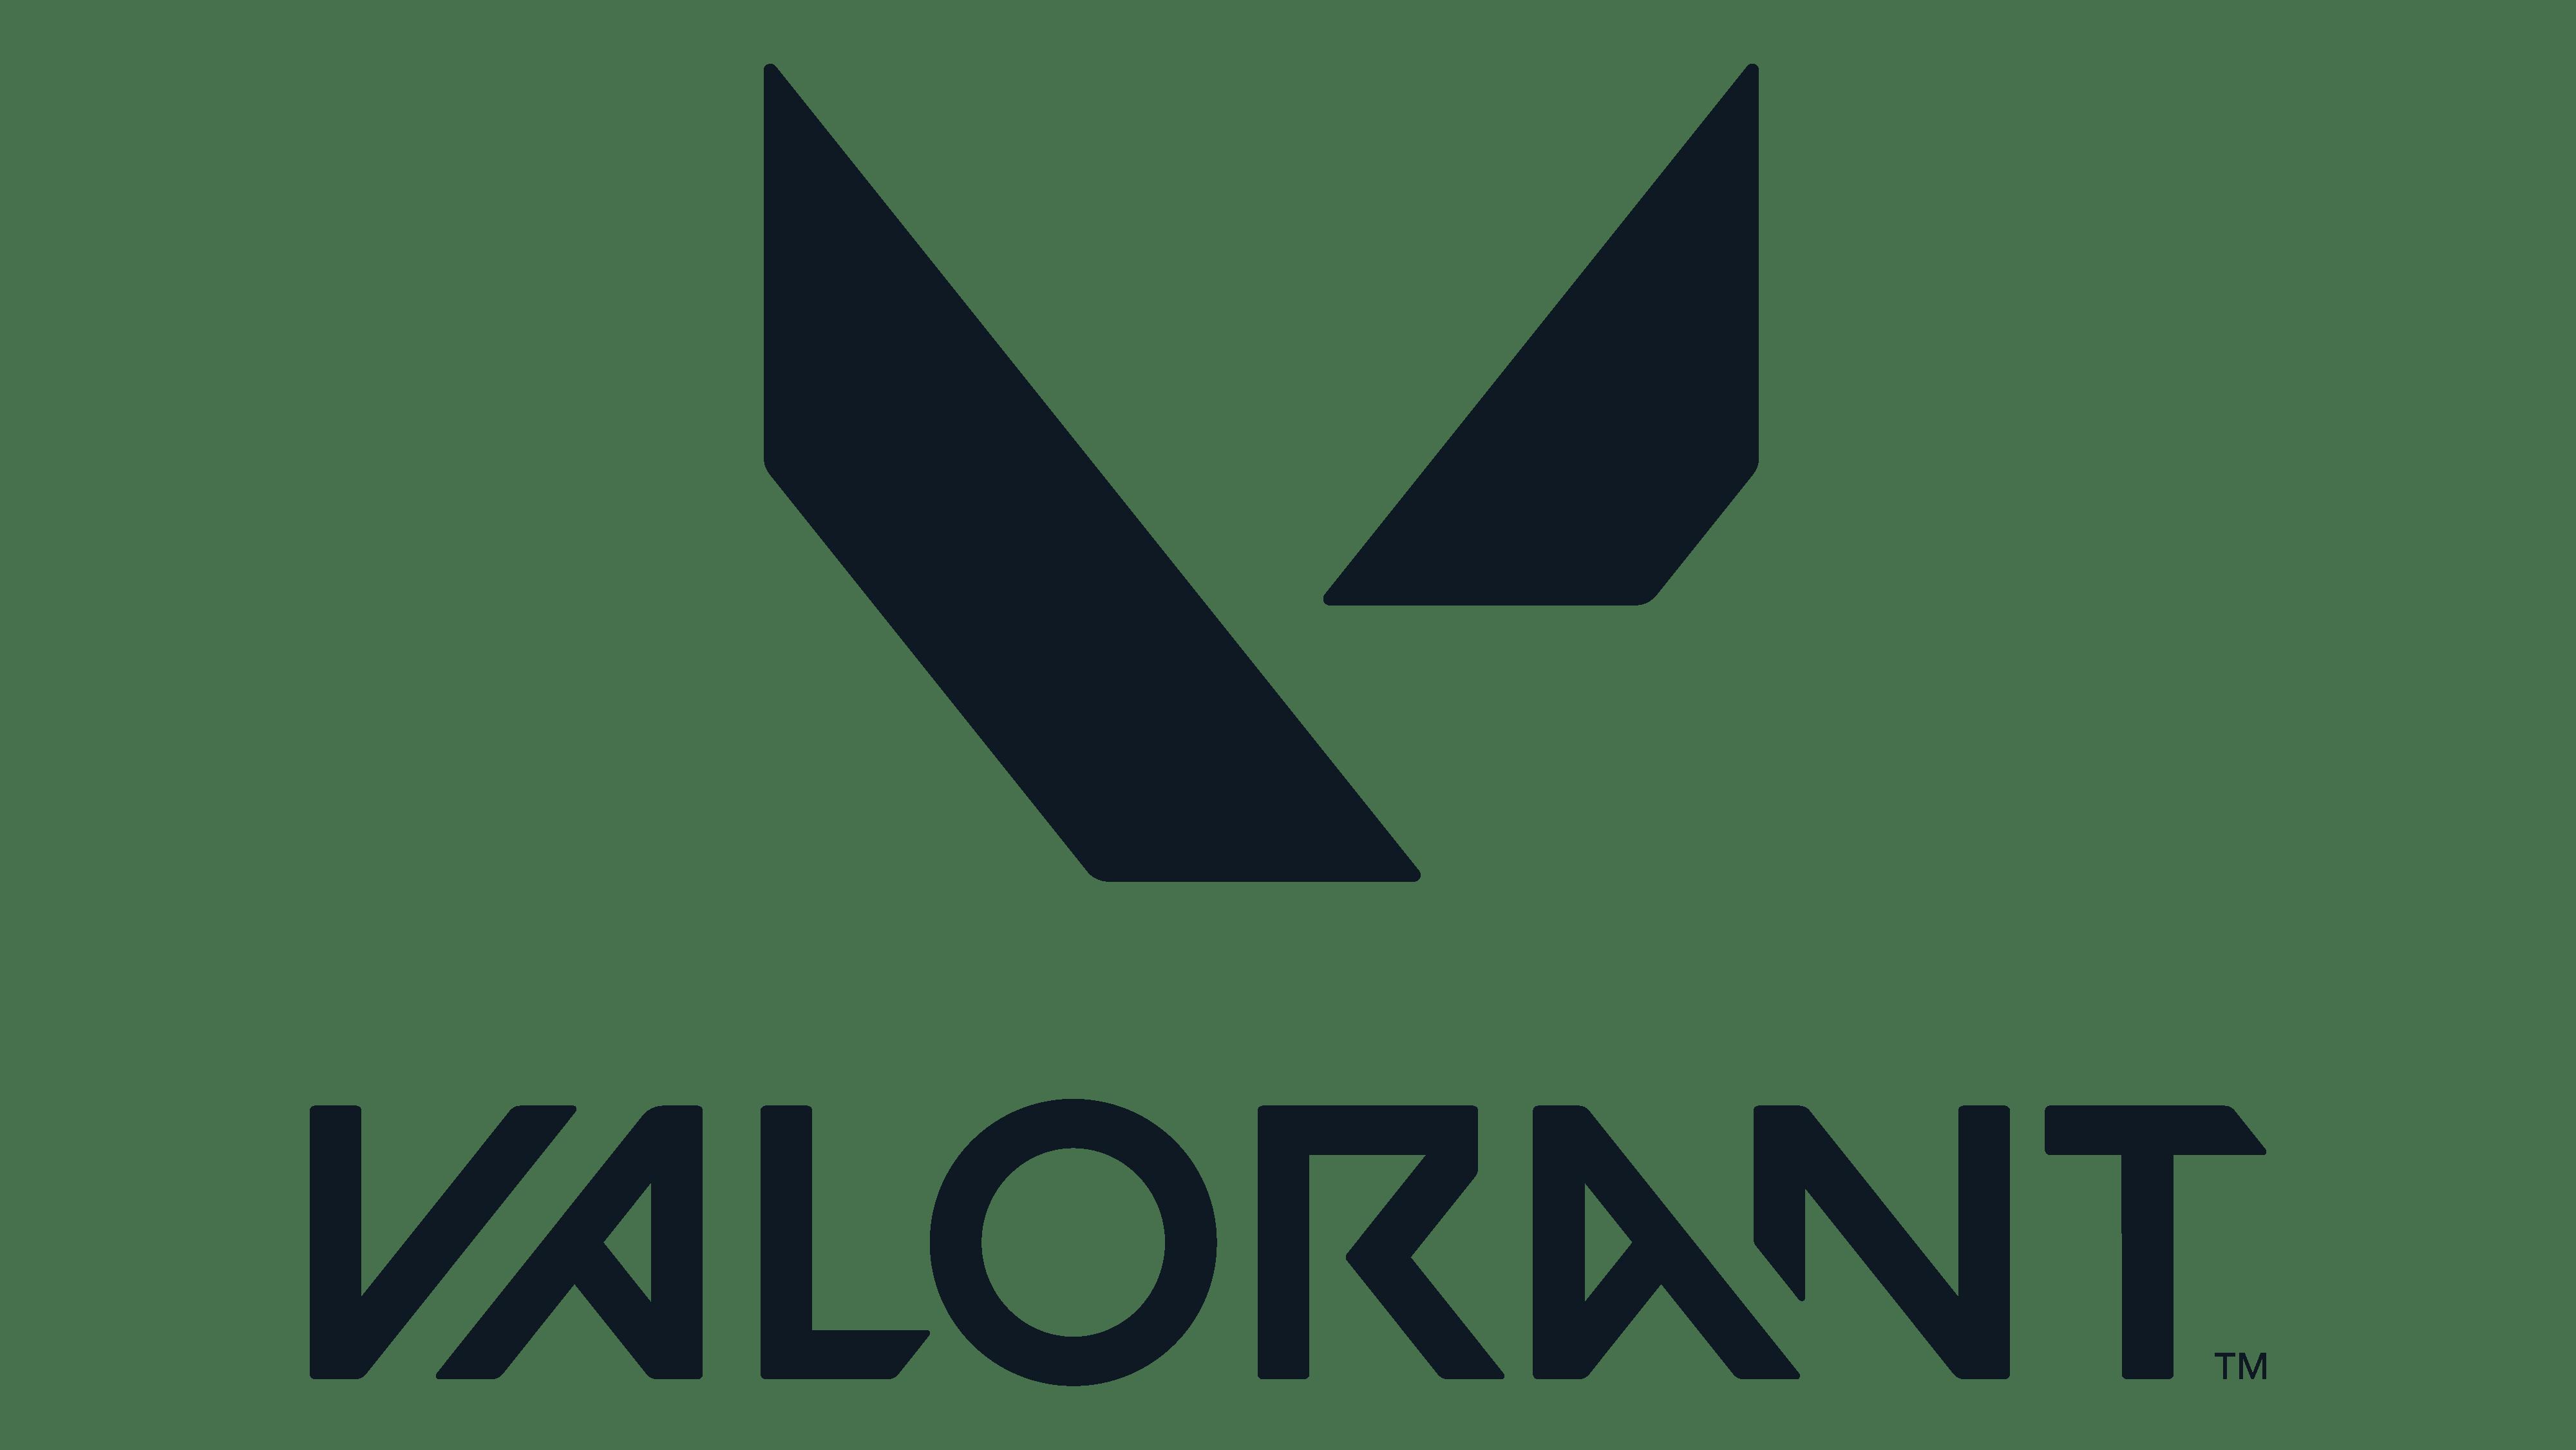 Logo Valorant Png Vector Png Vetores Tutoriais